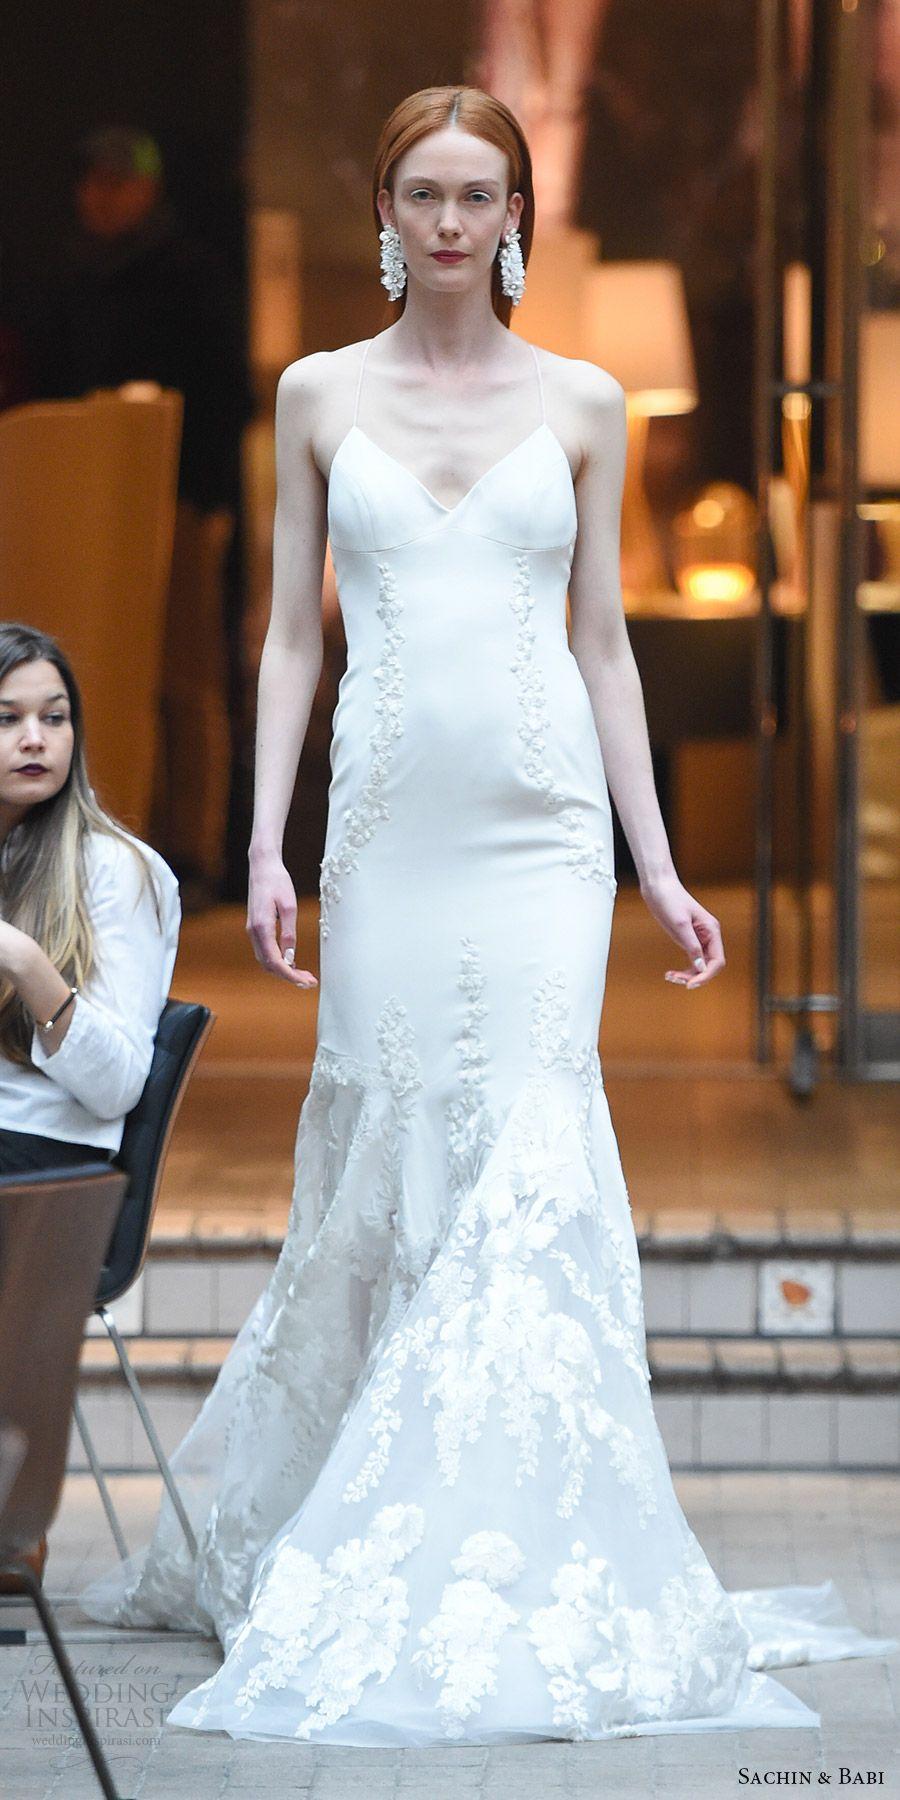 Sachin u babi spring wedding dresses u new york bridal fashion